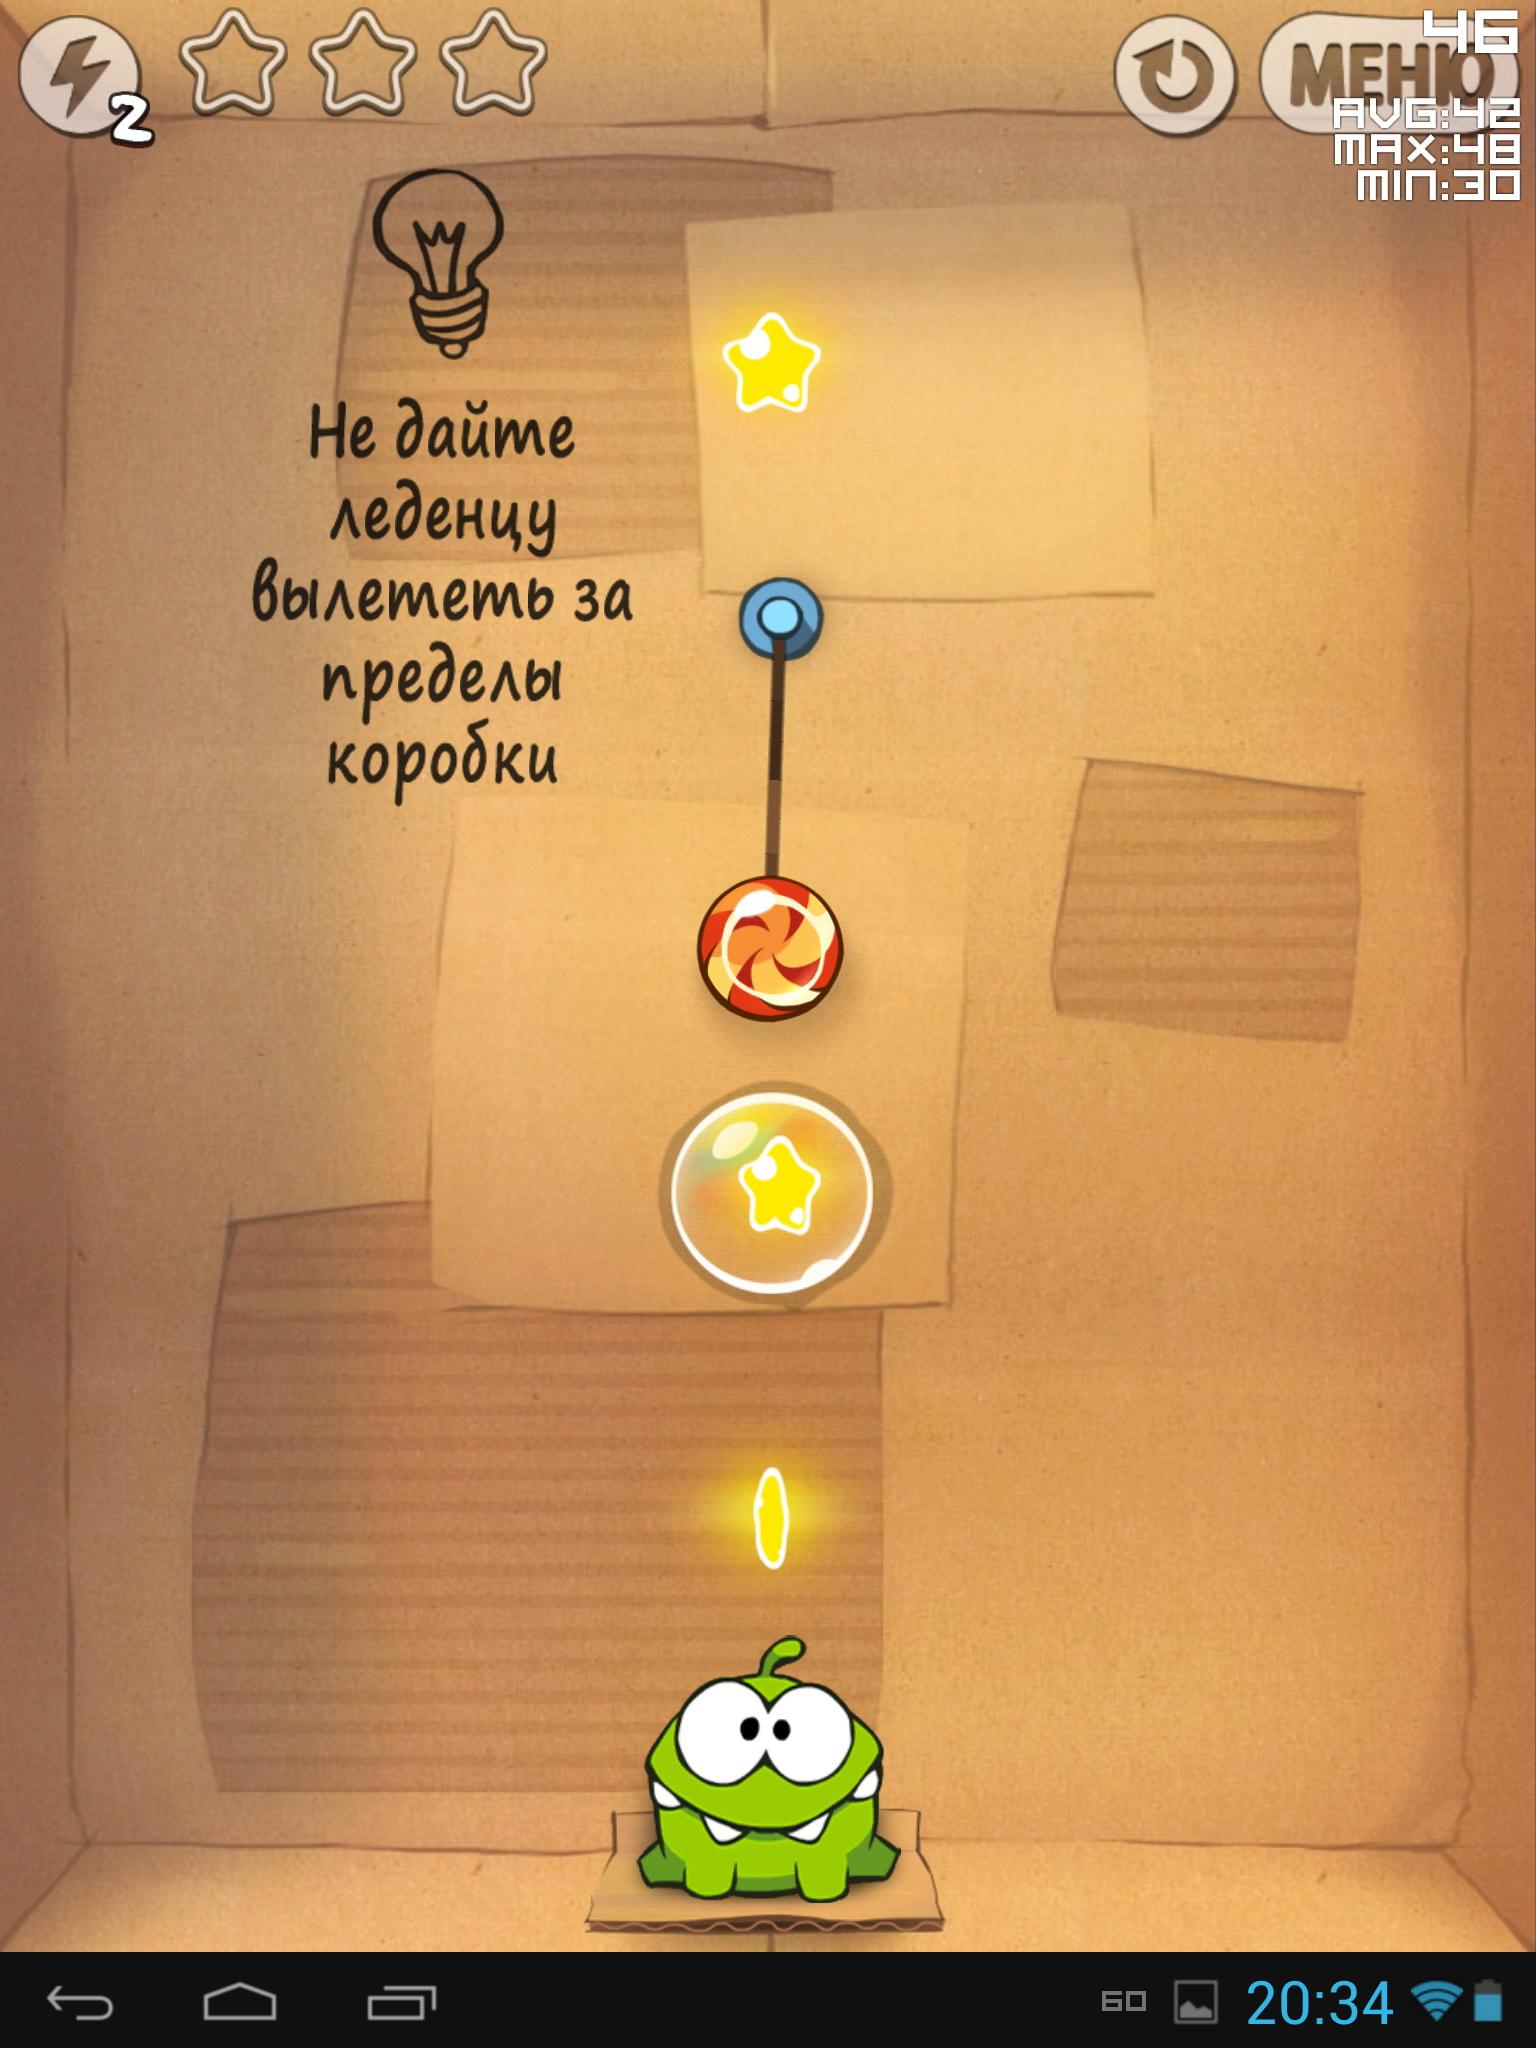 Скачать Игру На Плоншет 4.0.Игра Cut The Rope Android